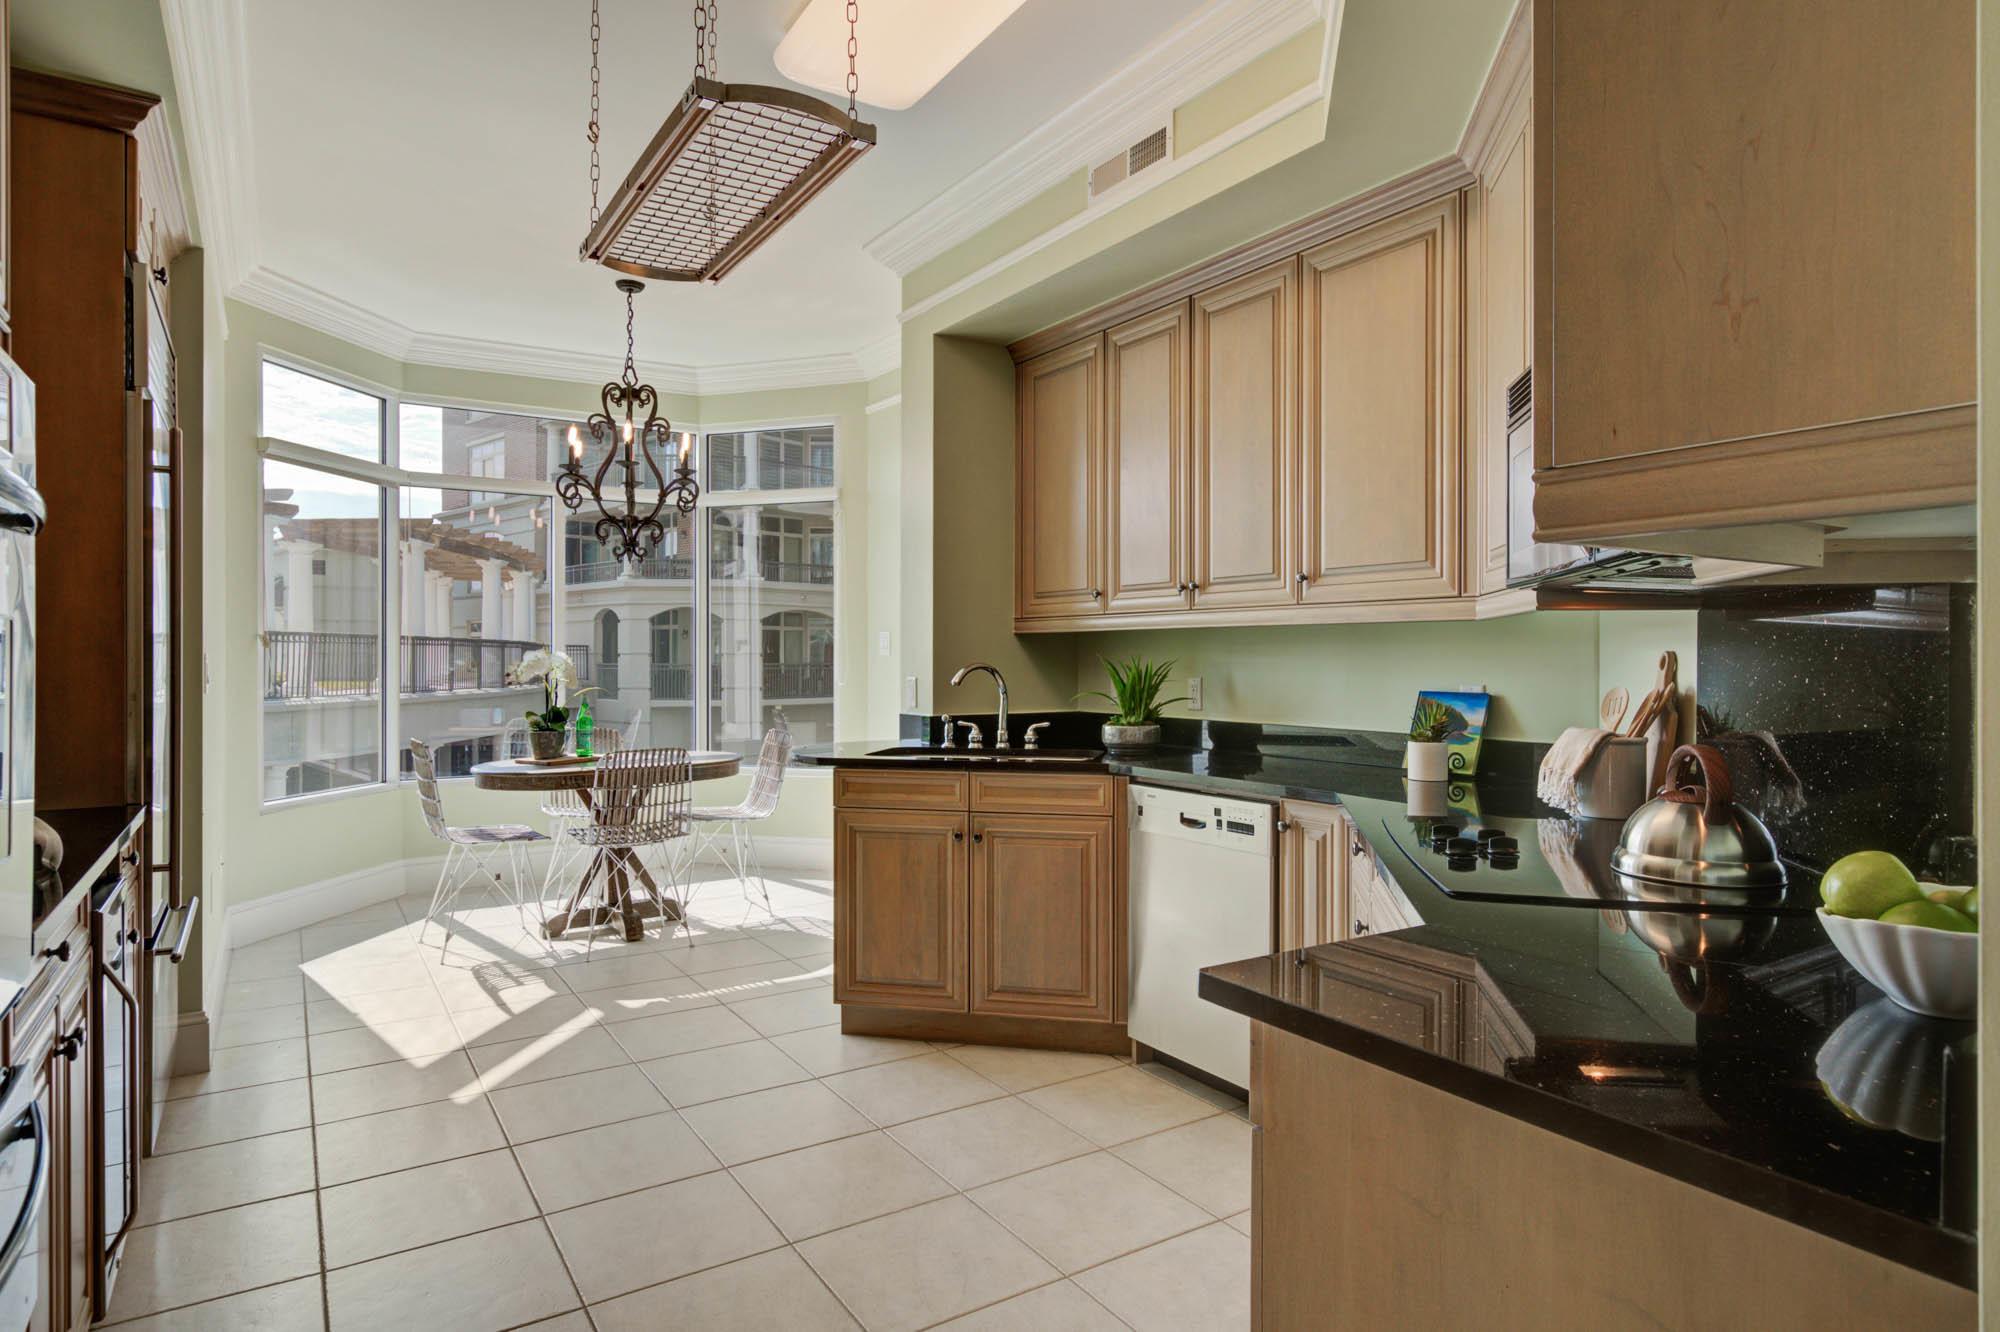 Renaissance On Chas Harbor Homes For Sale - 125 Plaza, Mount Pleasant, SC - 32